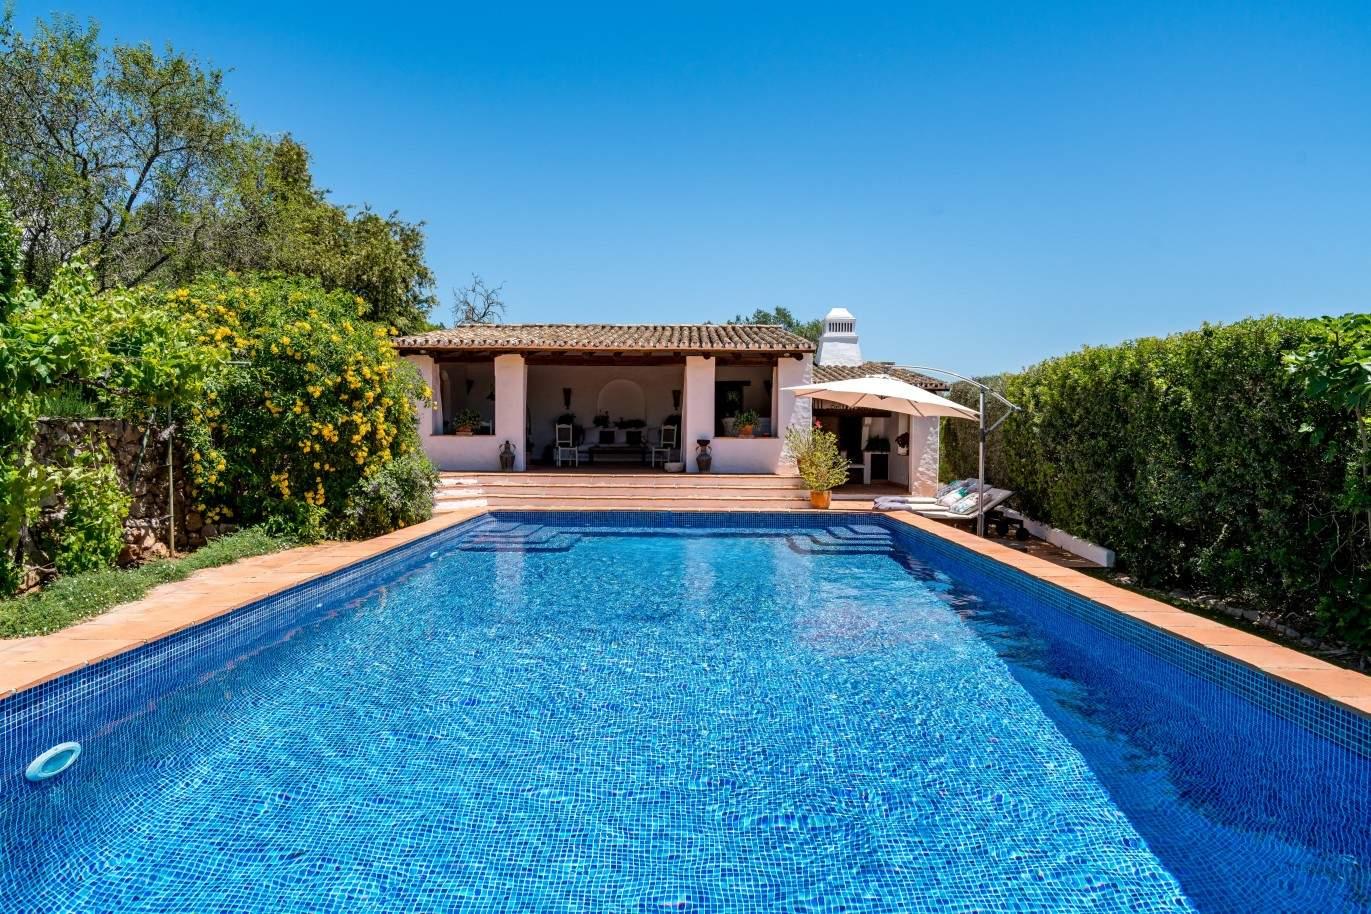 villa-for-sale-with-pool-terrace-garden-in-loule-algarve-portugal